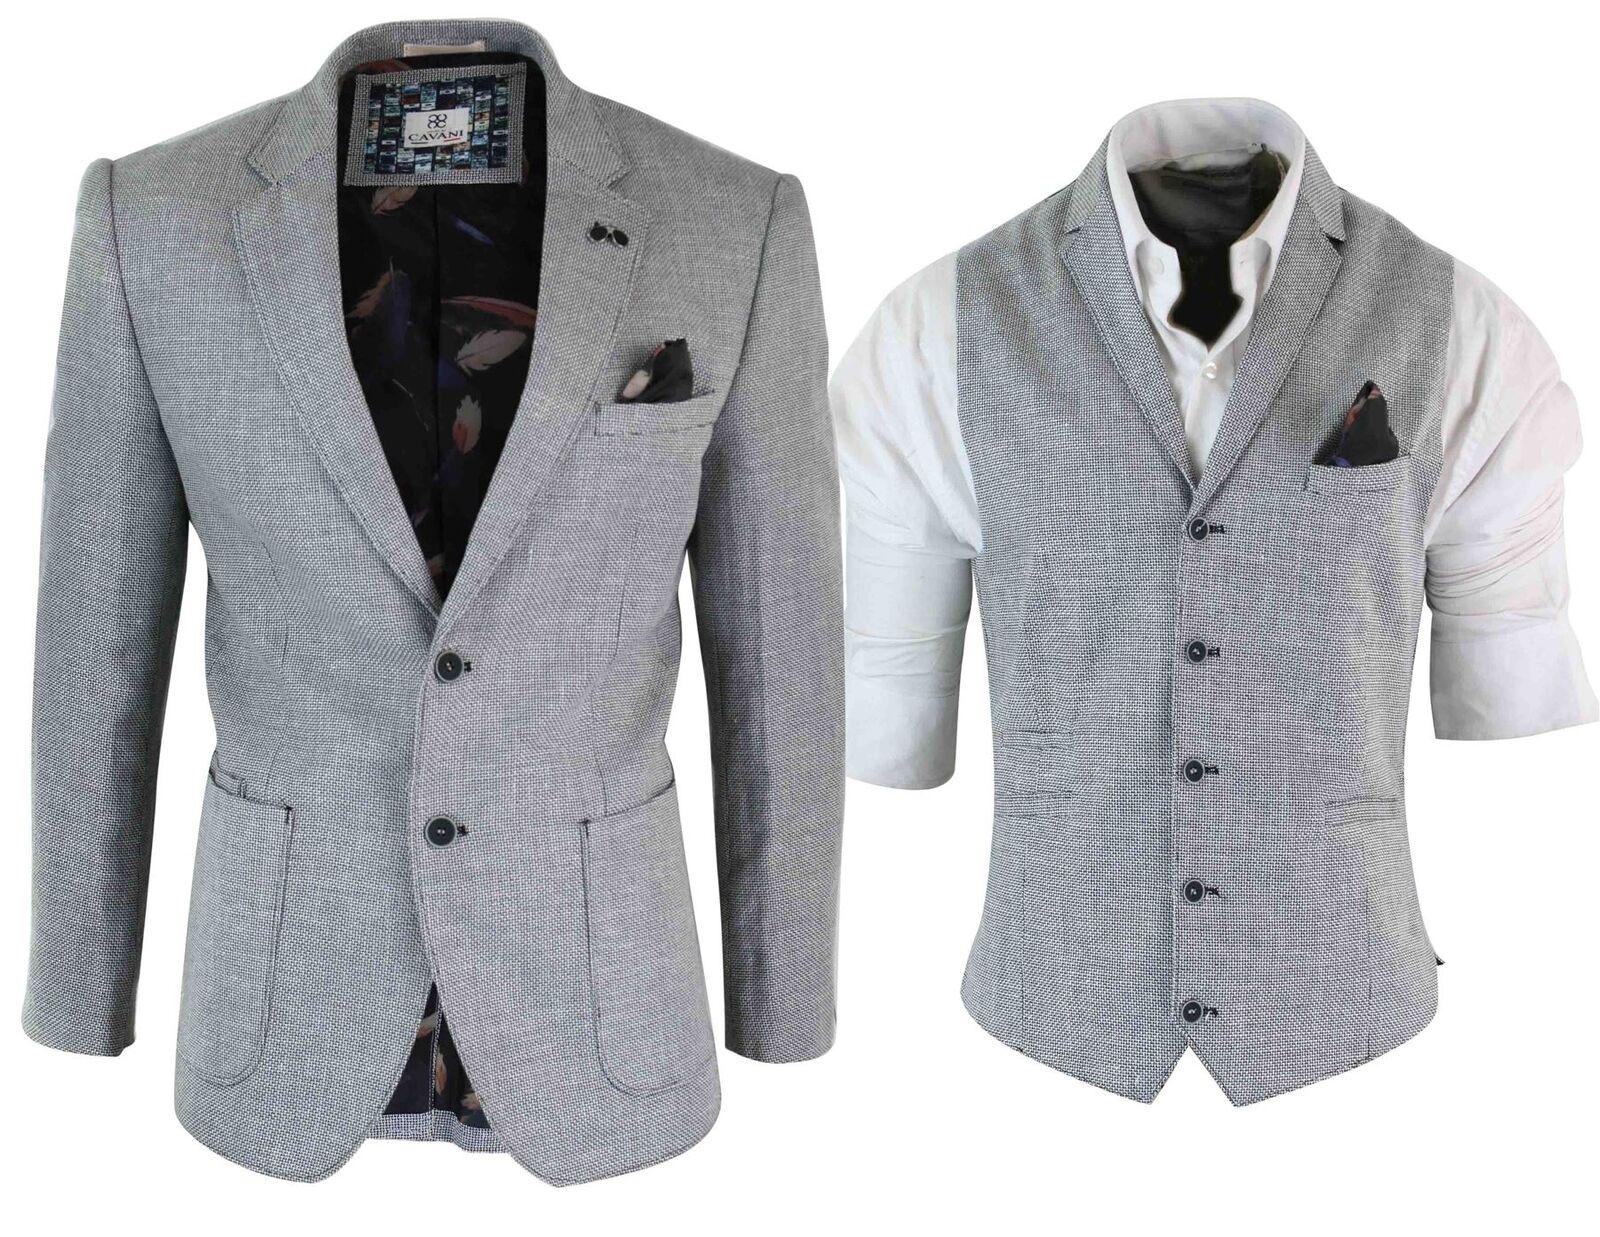 Herren Cotton Linen Light Grau Smart Casual Blazer or Waistcoat TailoROT Fit